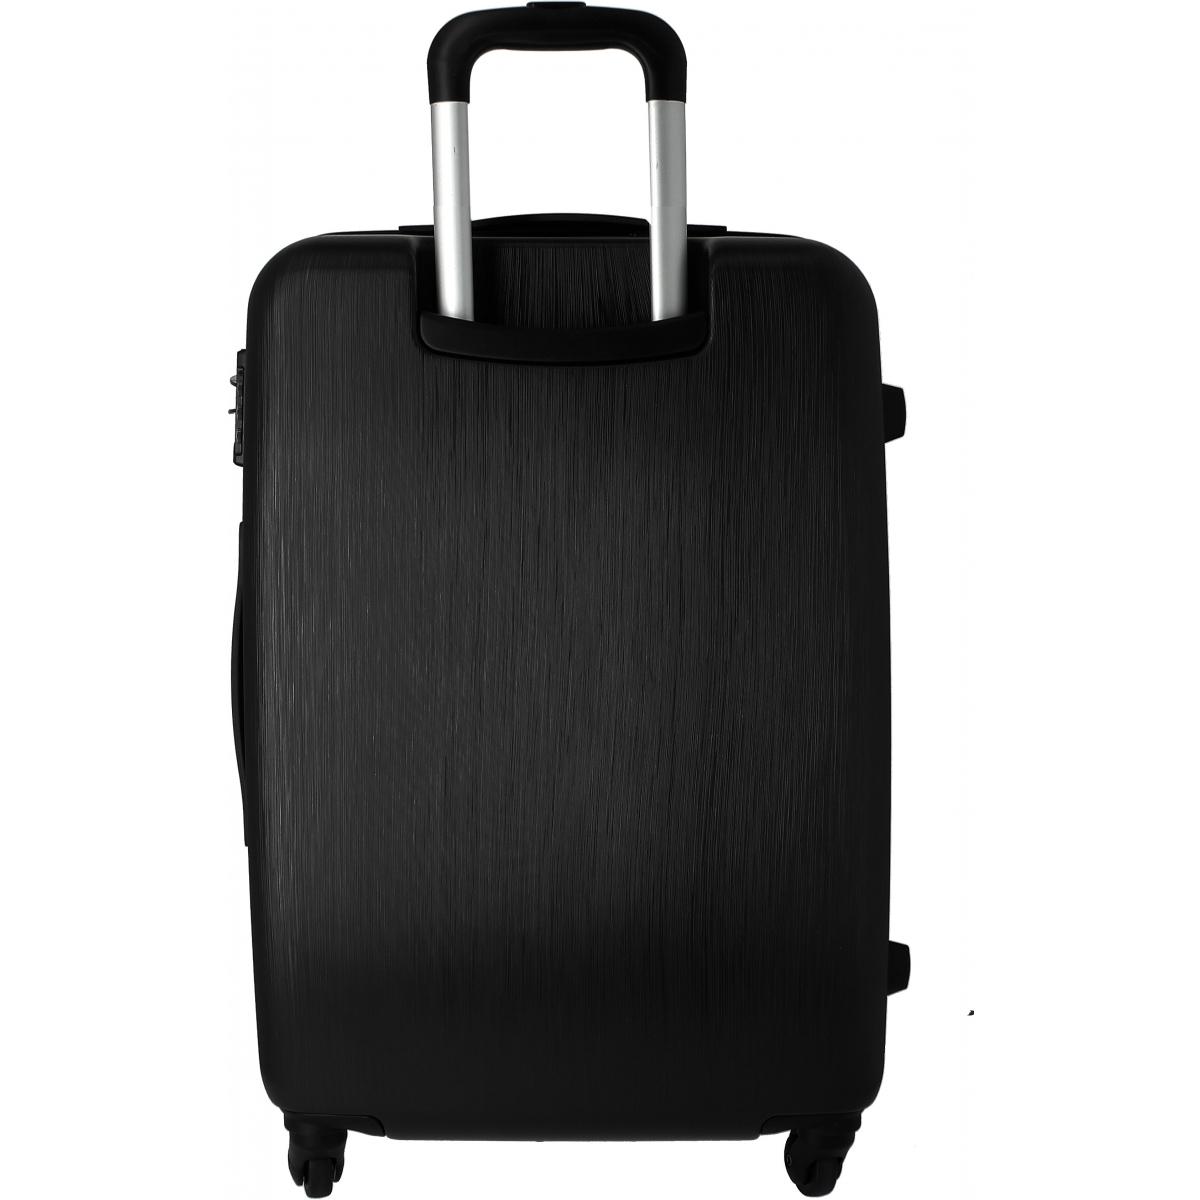 valise rigide david jones taille g tsa ba10141g couleur principale noir valise. Black Bedroom Furniture Sets. Home Design Ideas